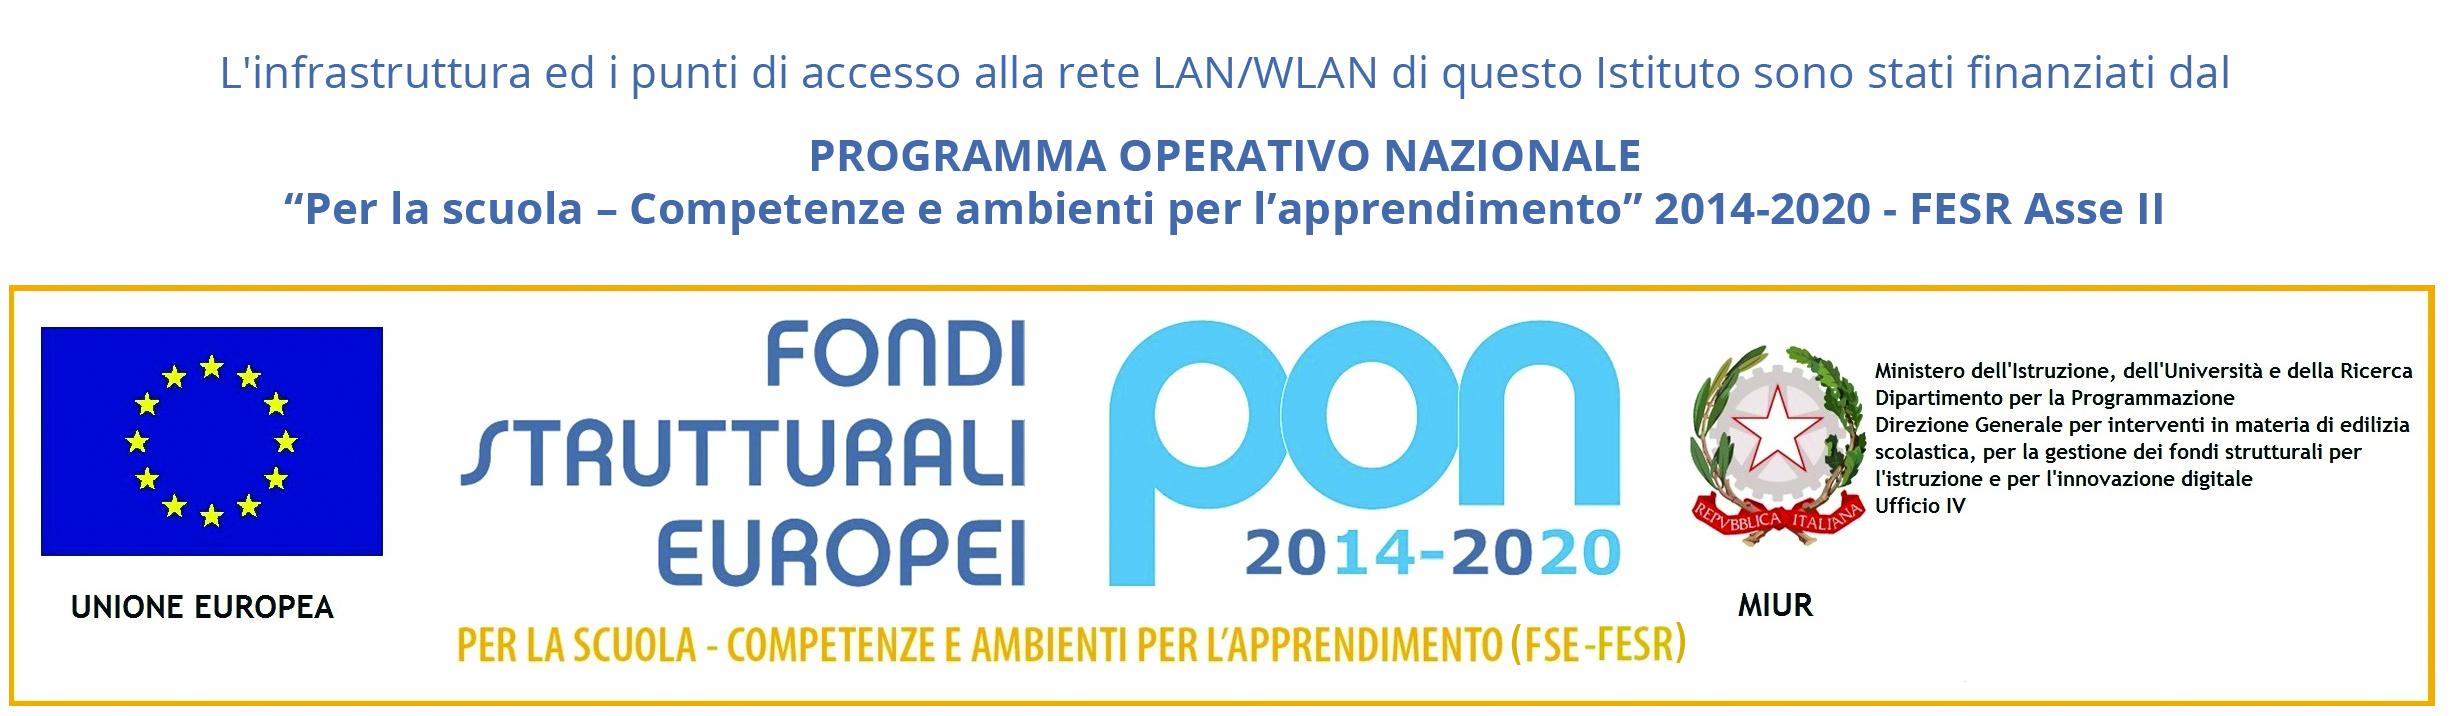 pon fondi strutturali europei 2014/2020